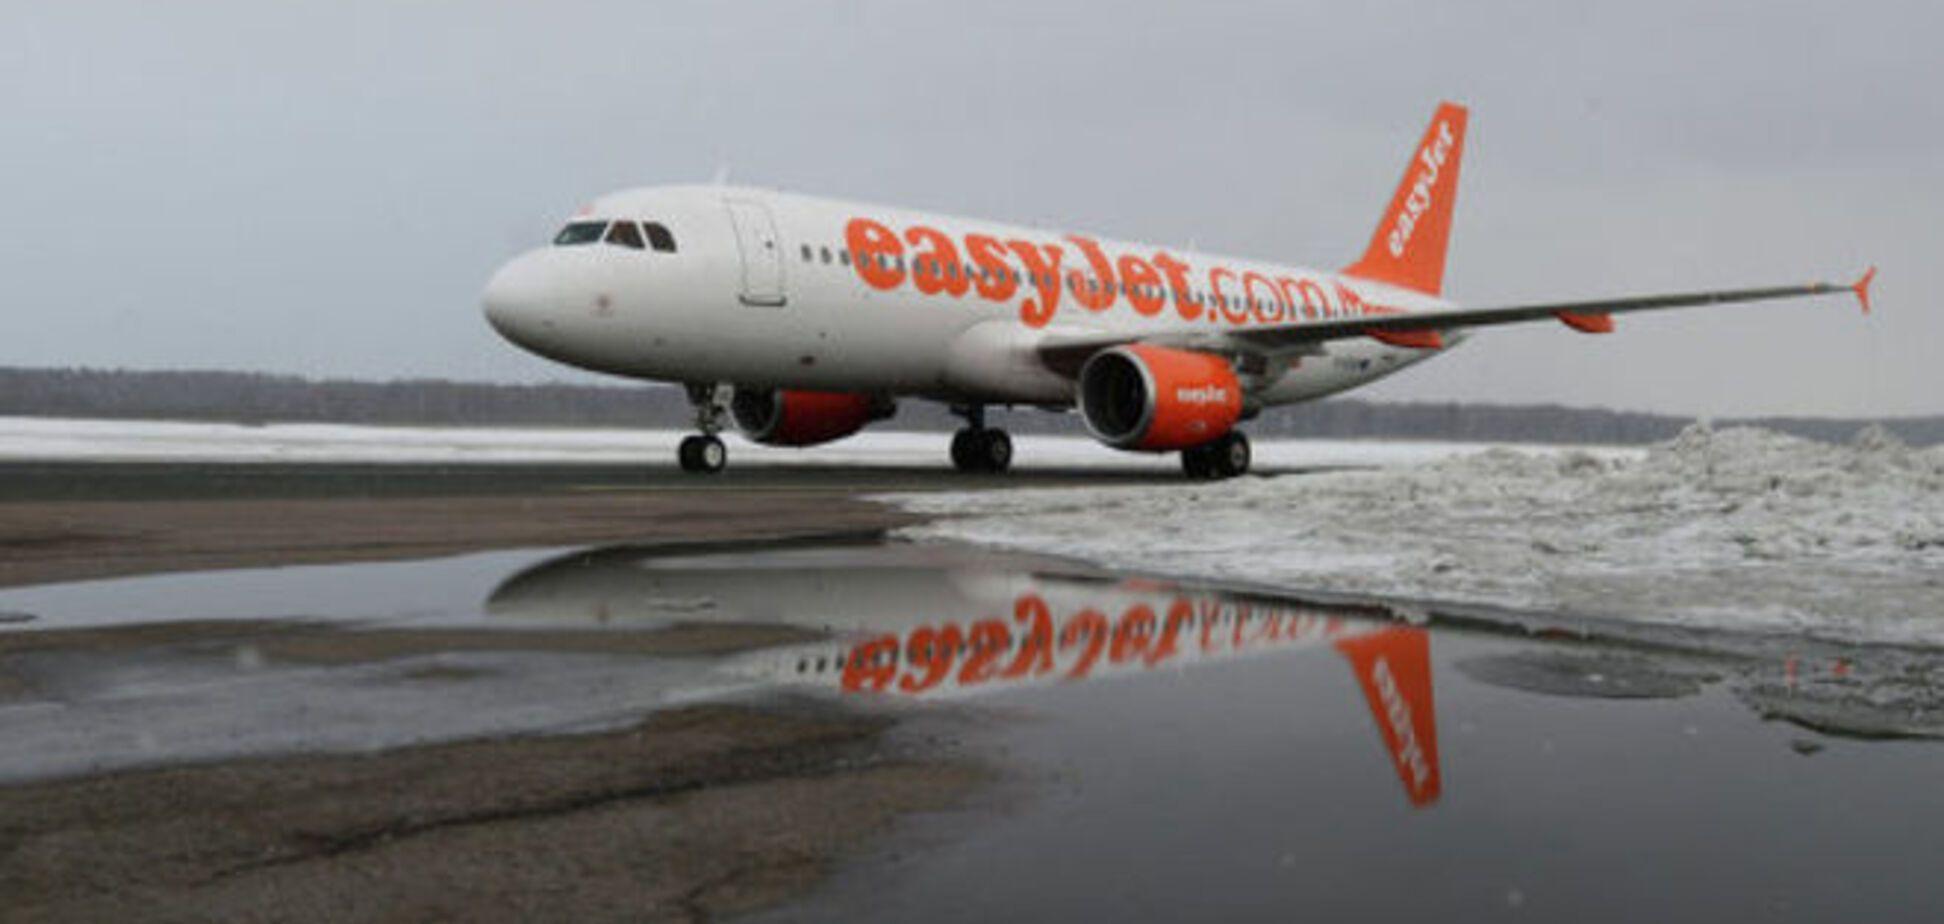 Пассажир самолета напал на стюардессу из-за ожидания сэндвича